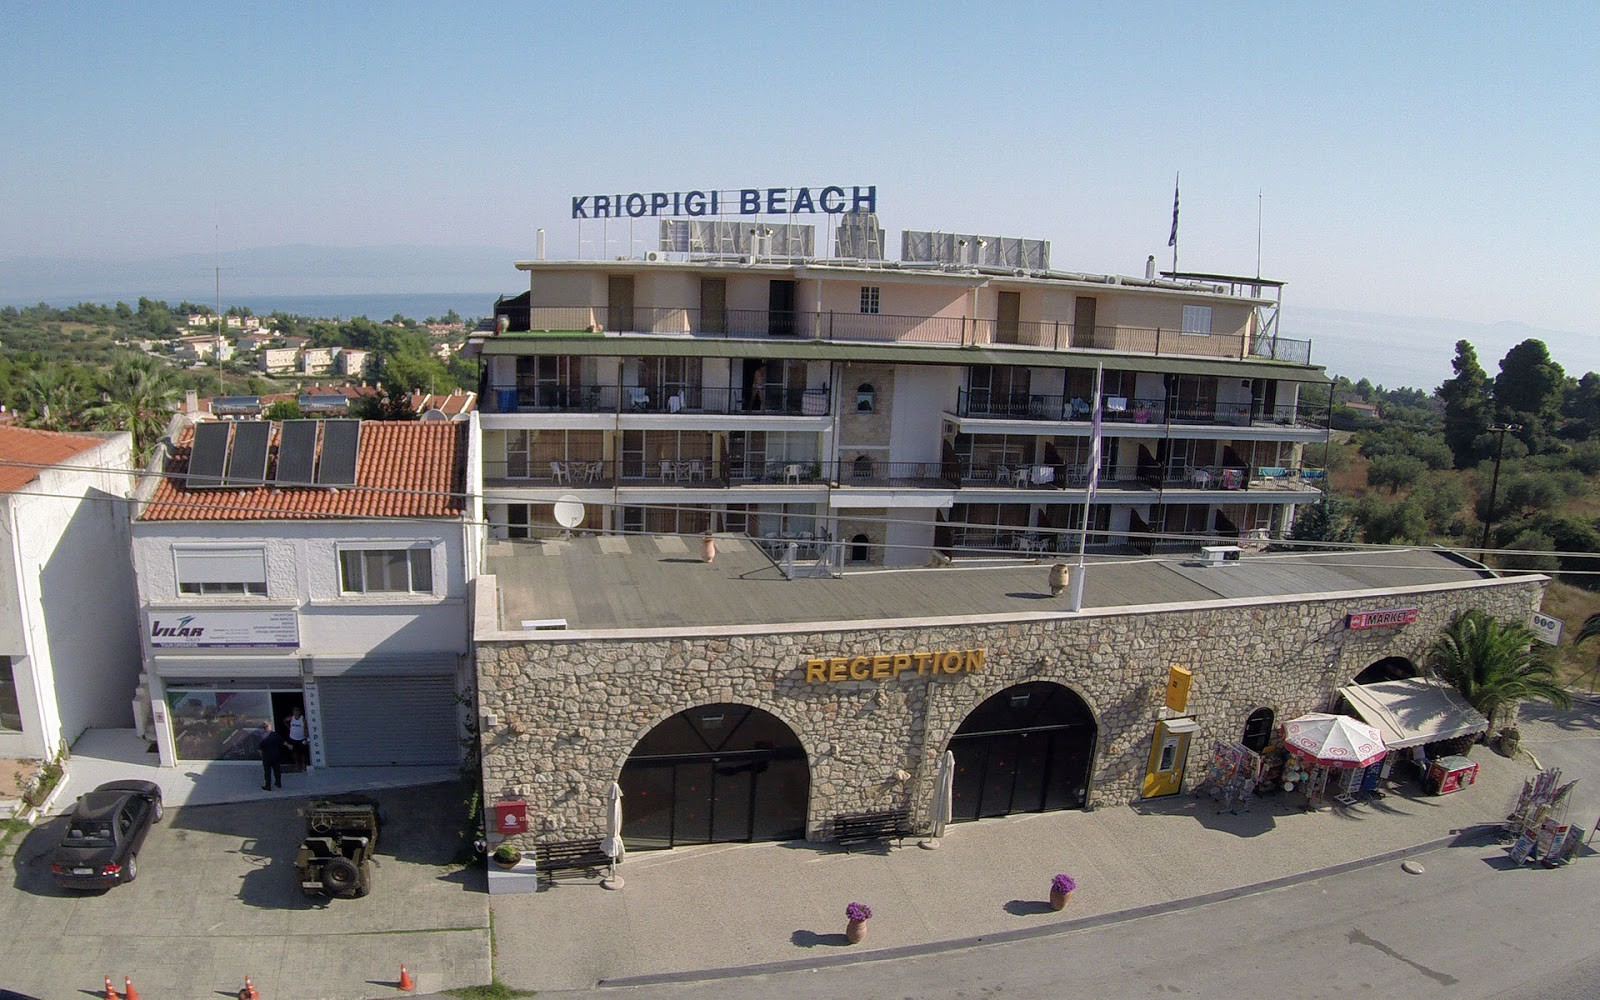 Kriopigi Beach Hotel front